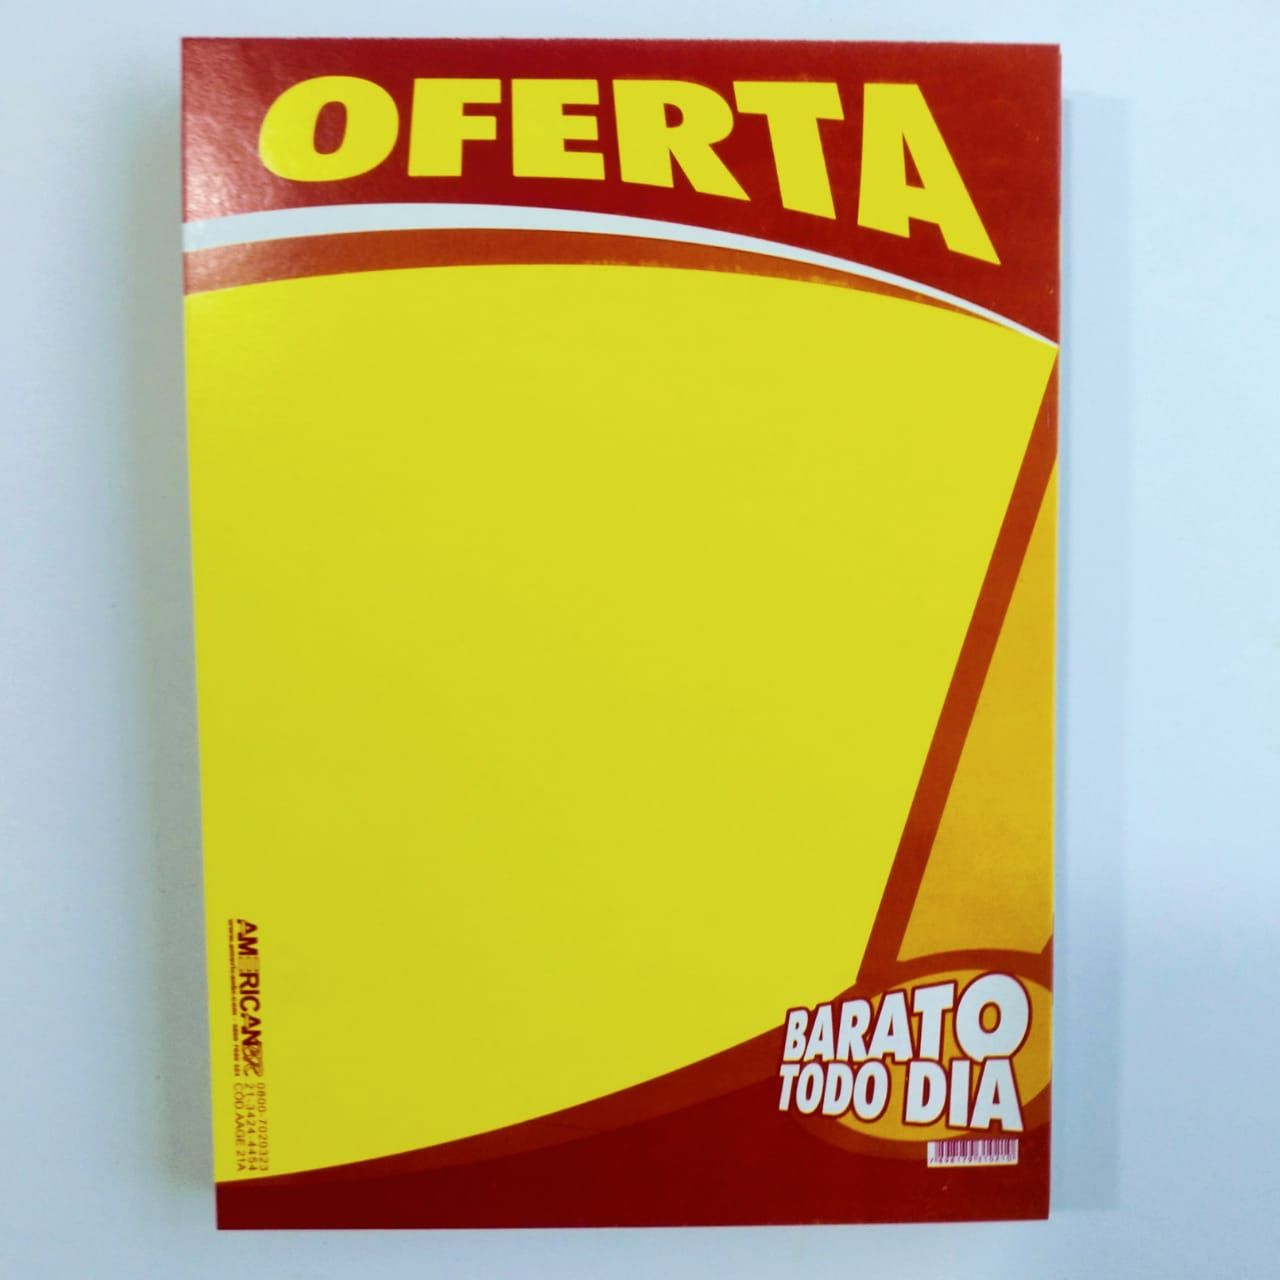 CARTAZ OFERTA BARATO TODO DIA 30X40CM (C/30 UNIDADES)